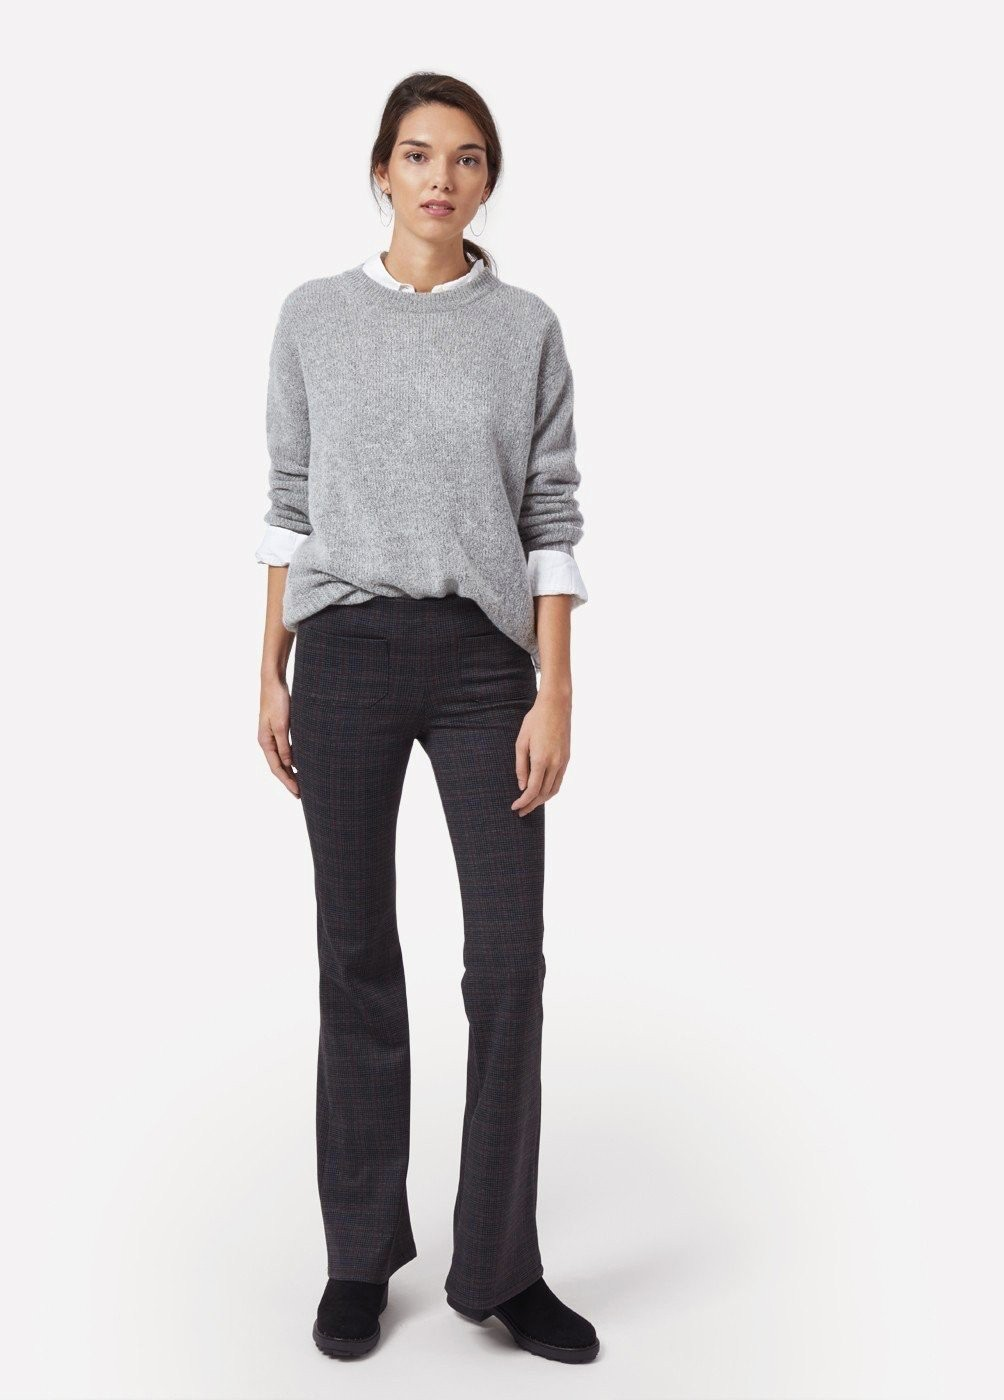 San trousers